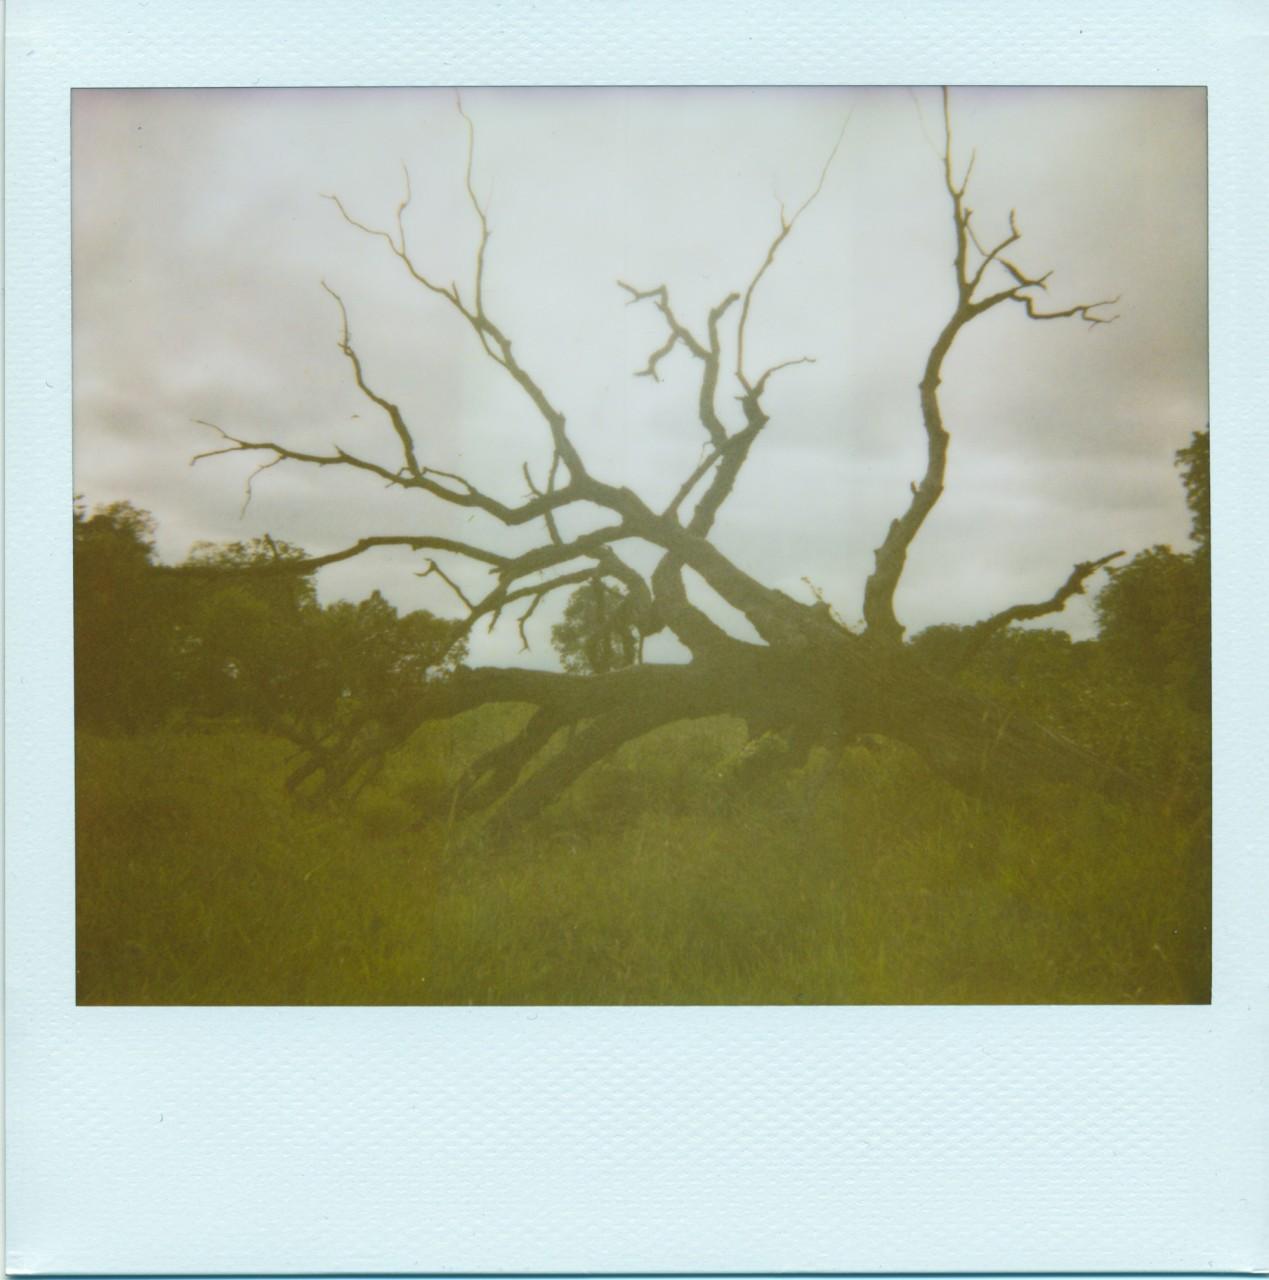 Polaroid Wedb_0018